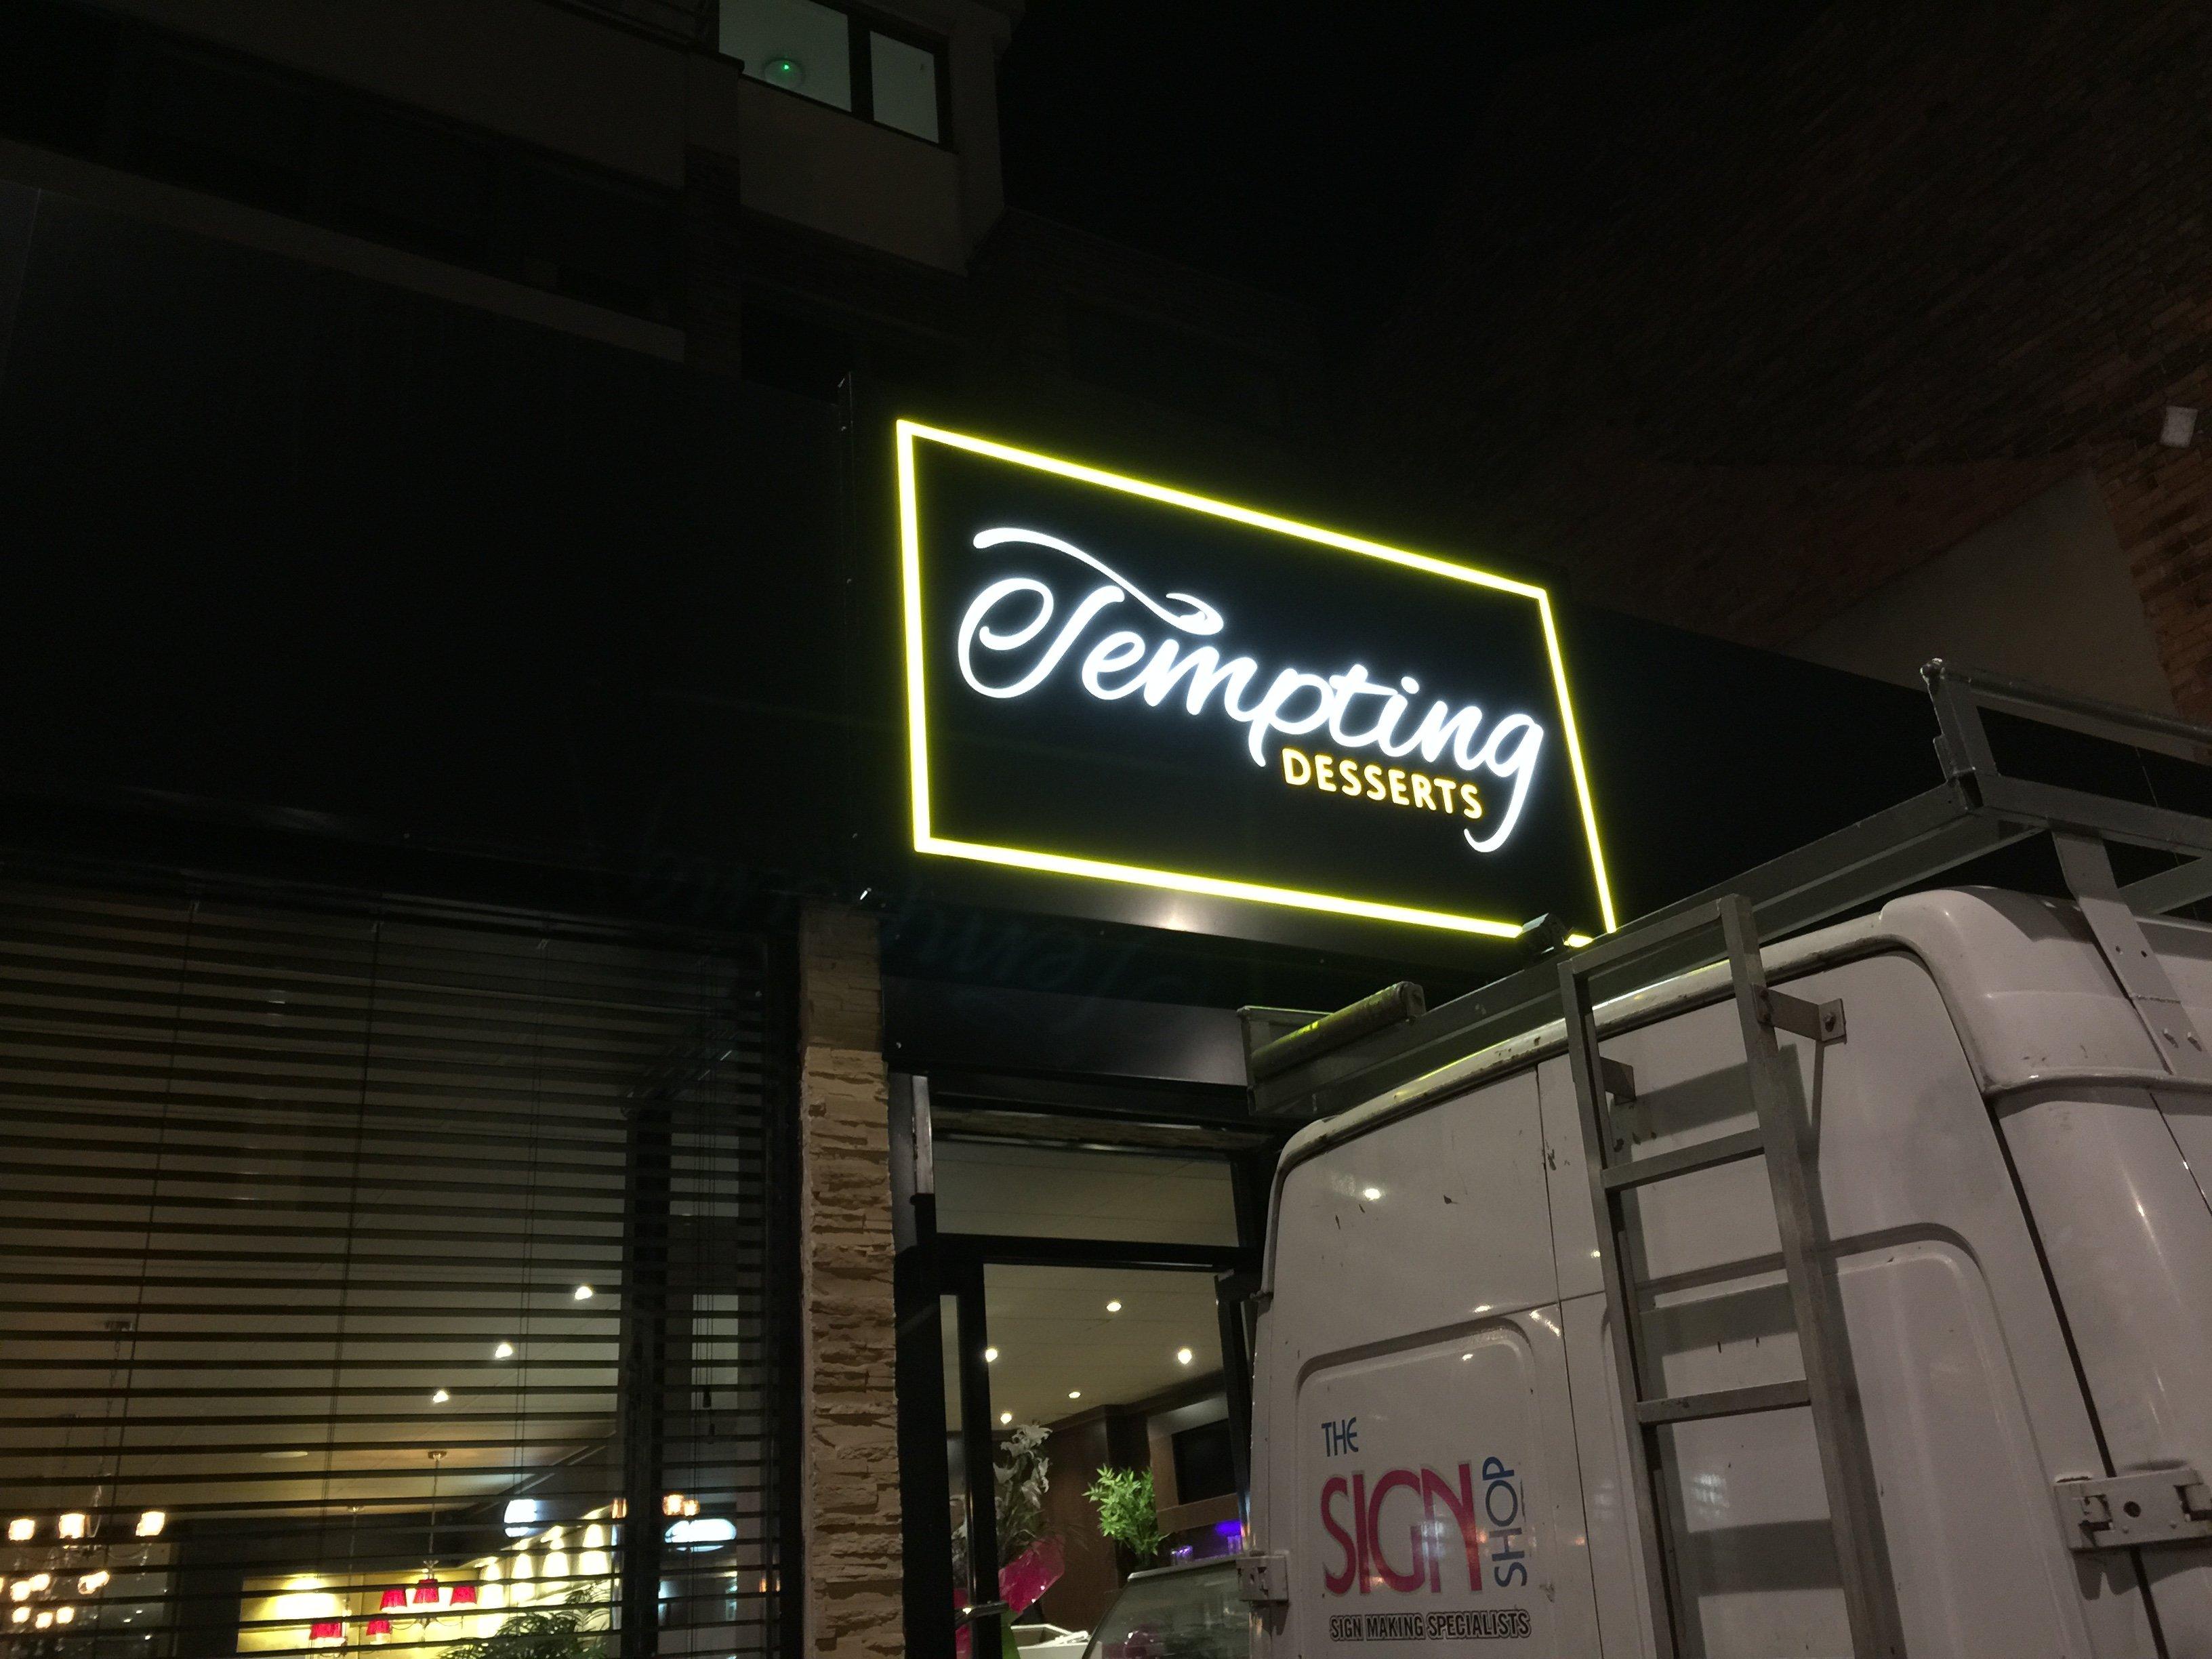 tempting desserts sign